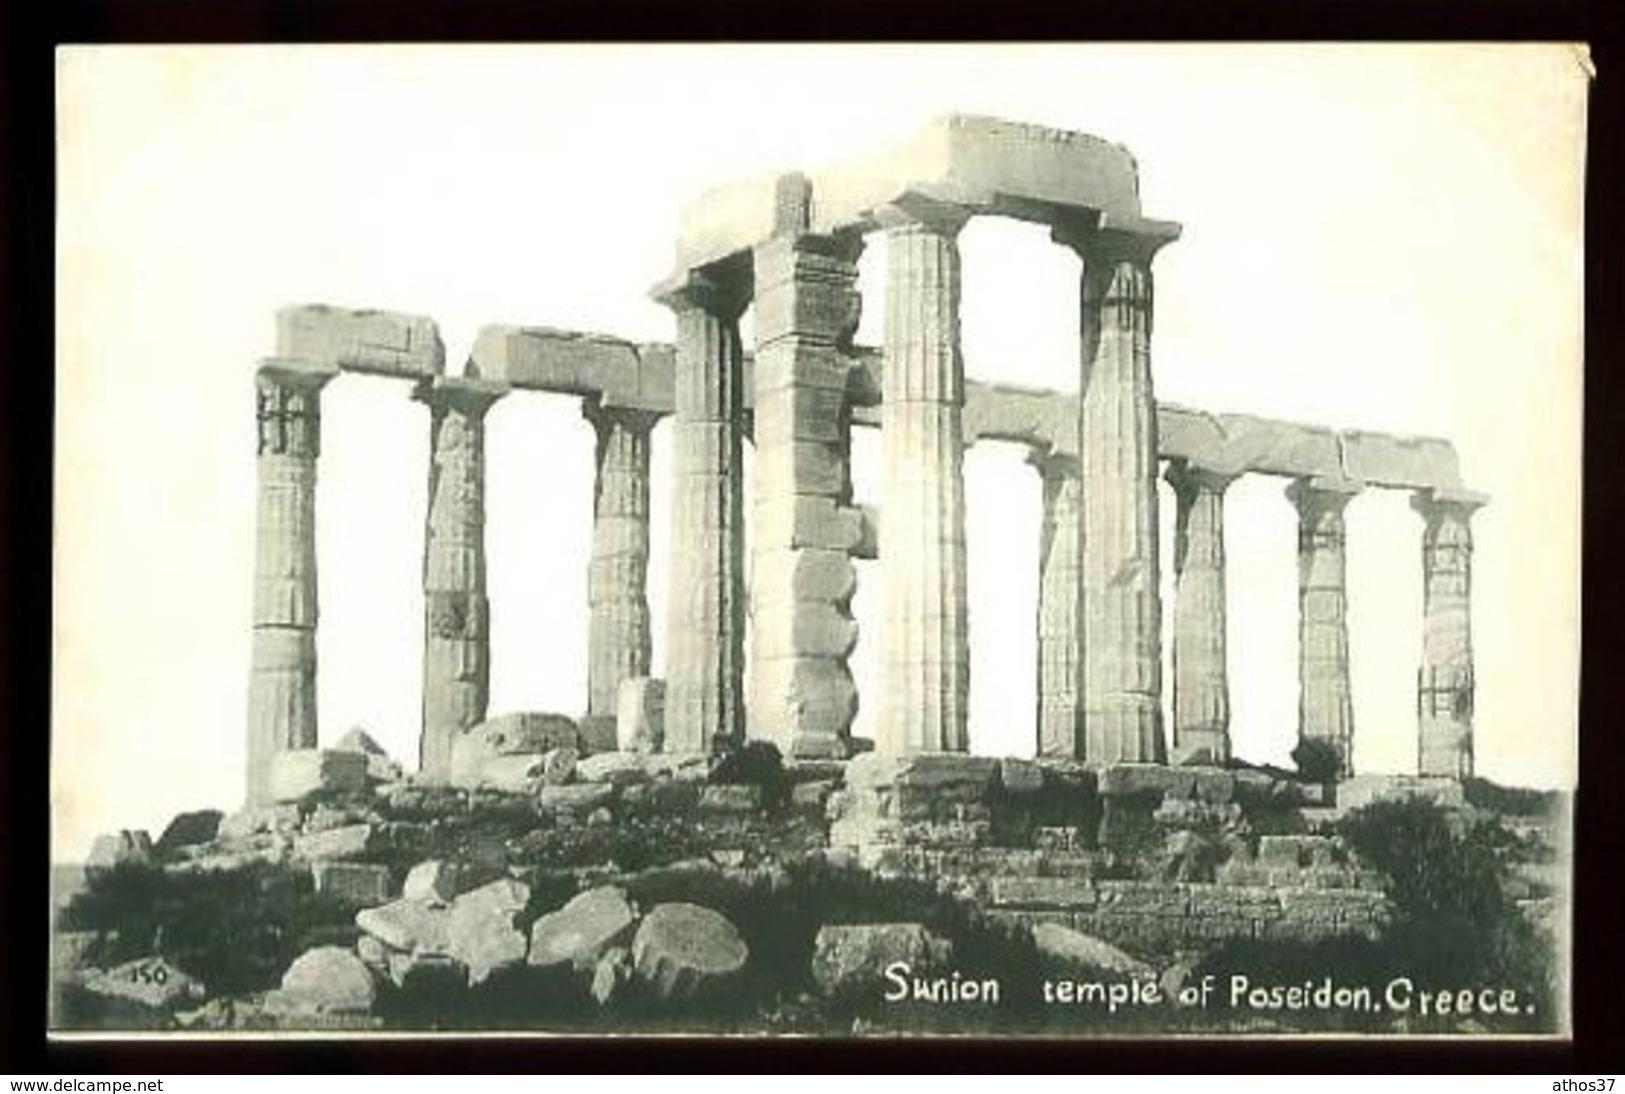 SUNION, Temple Of Poseidon - Carte-Photo Avec Légende écrite à La Main - (Beau Plan) - Greece